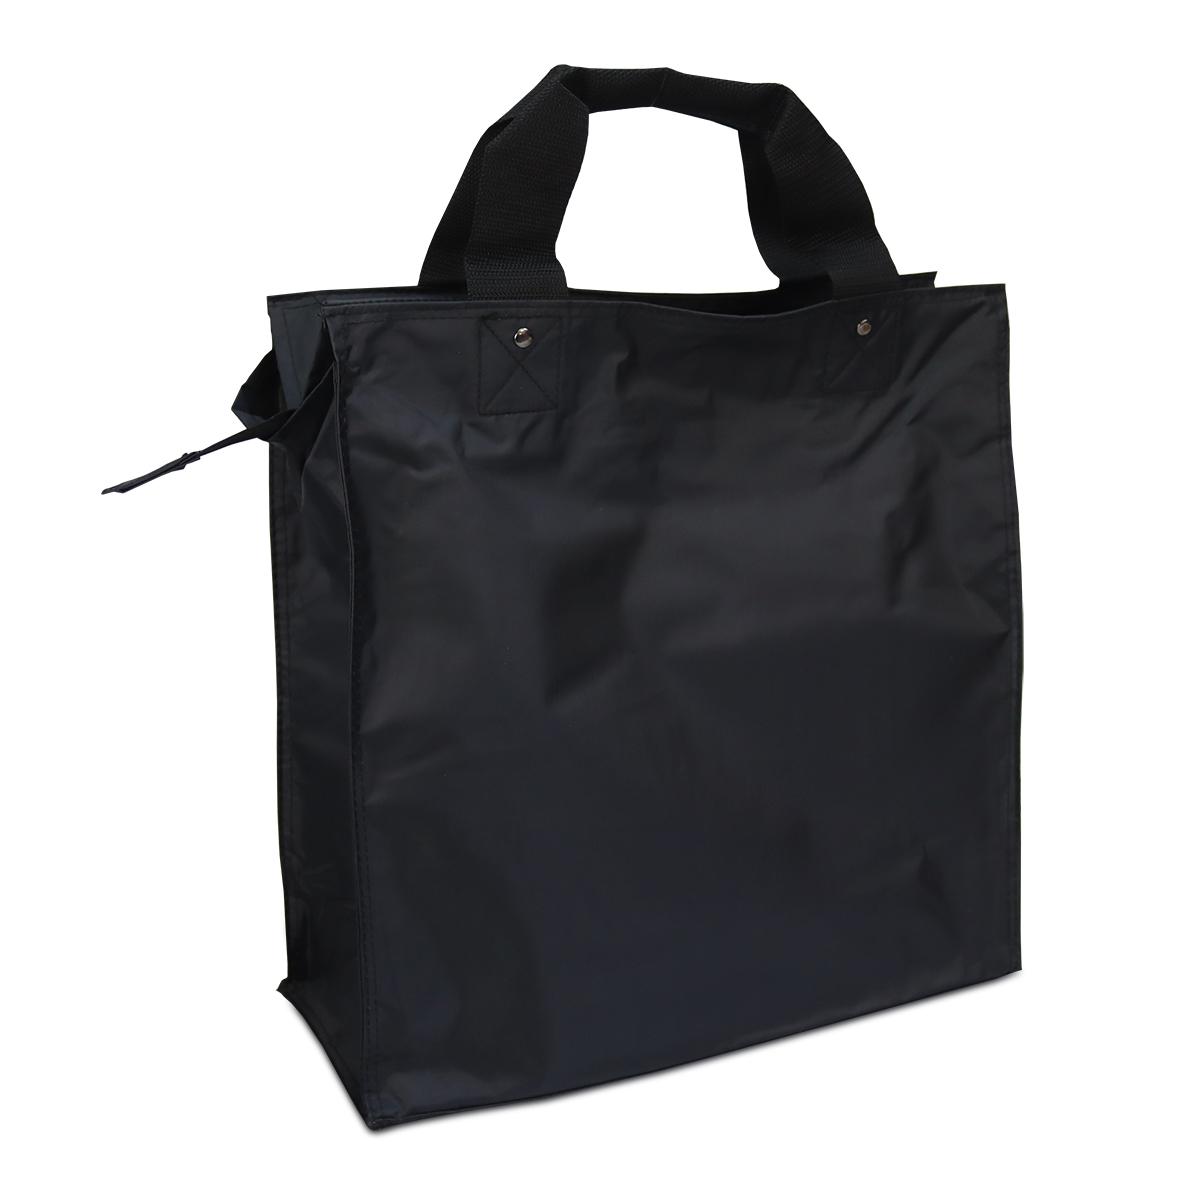 accountbag-zwart-product